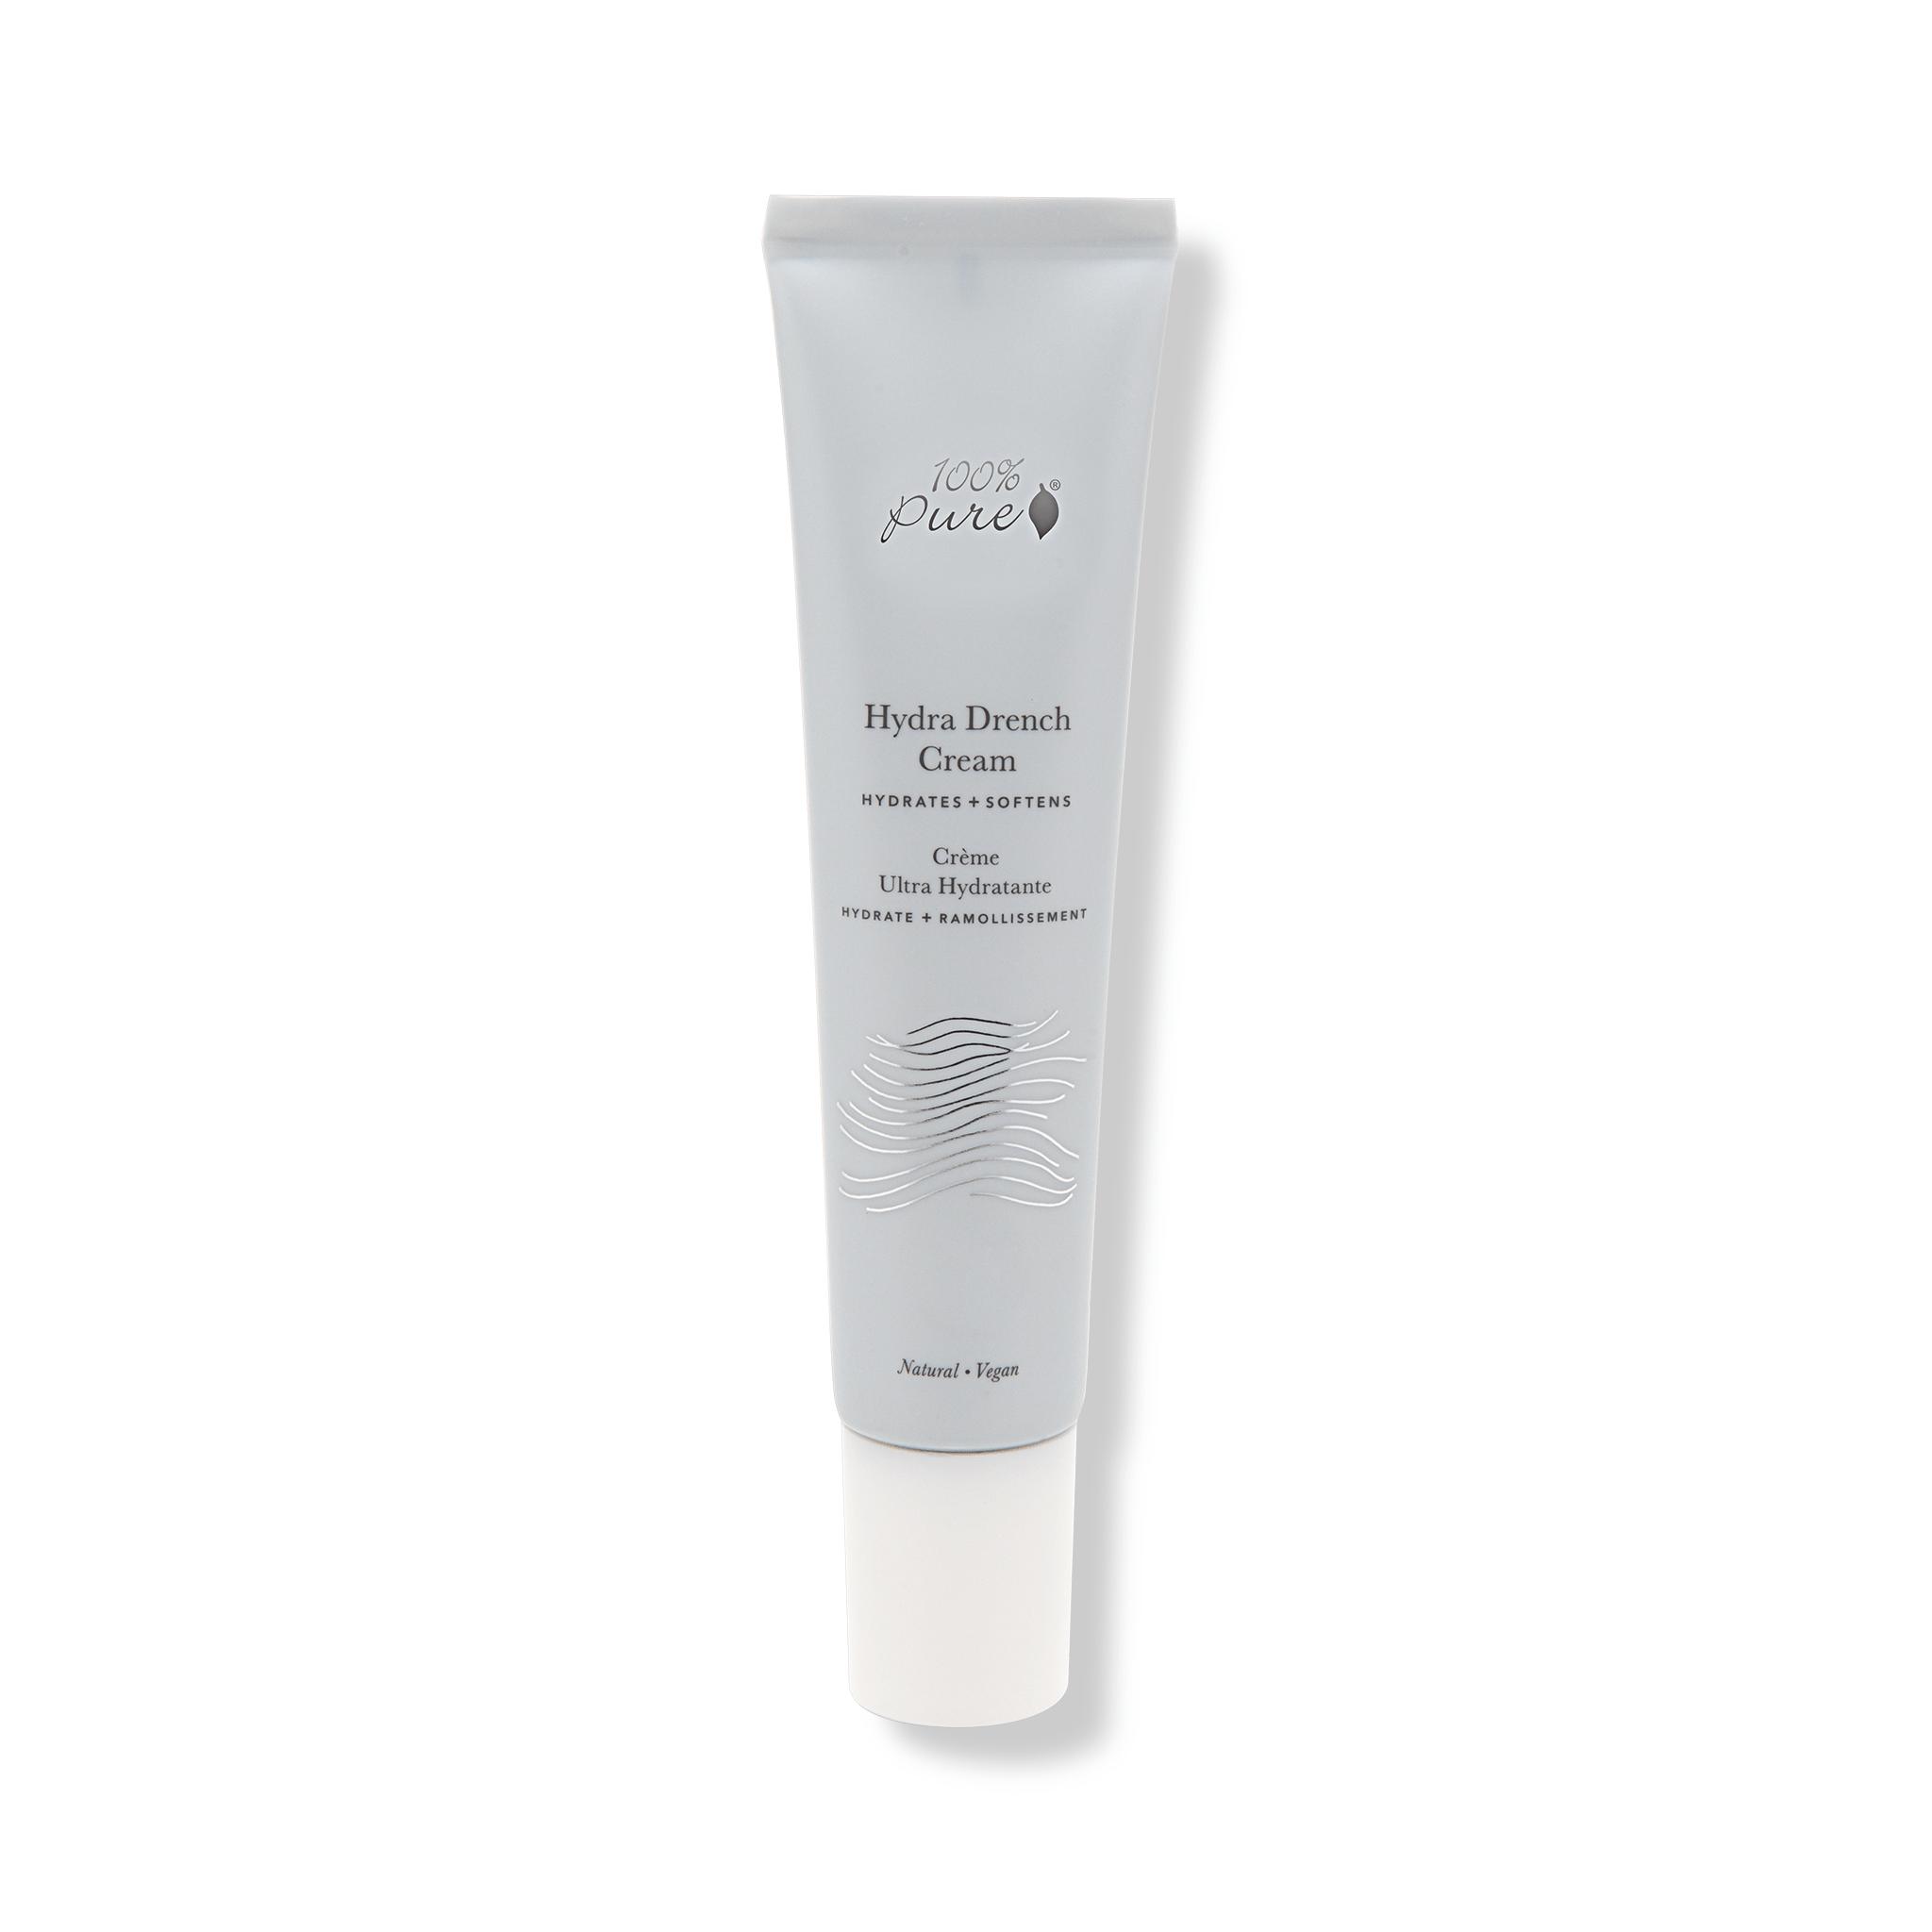 Product Grid - Hydra Drench Cream